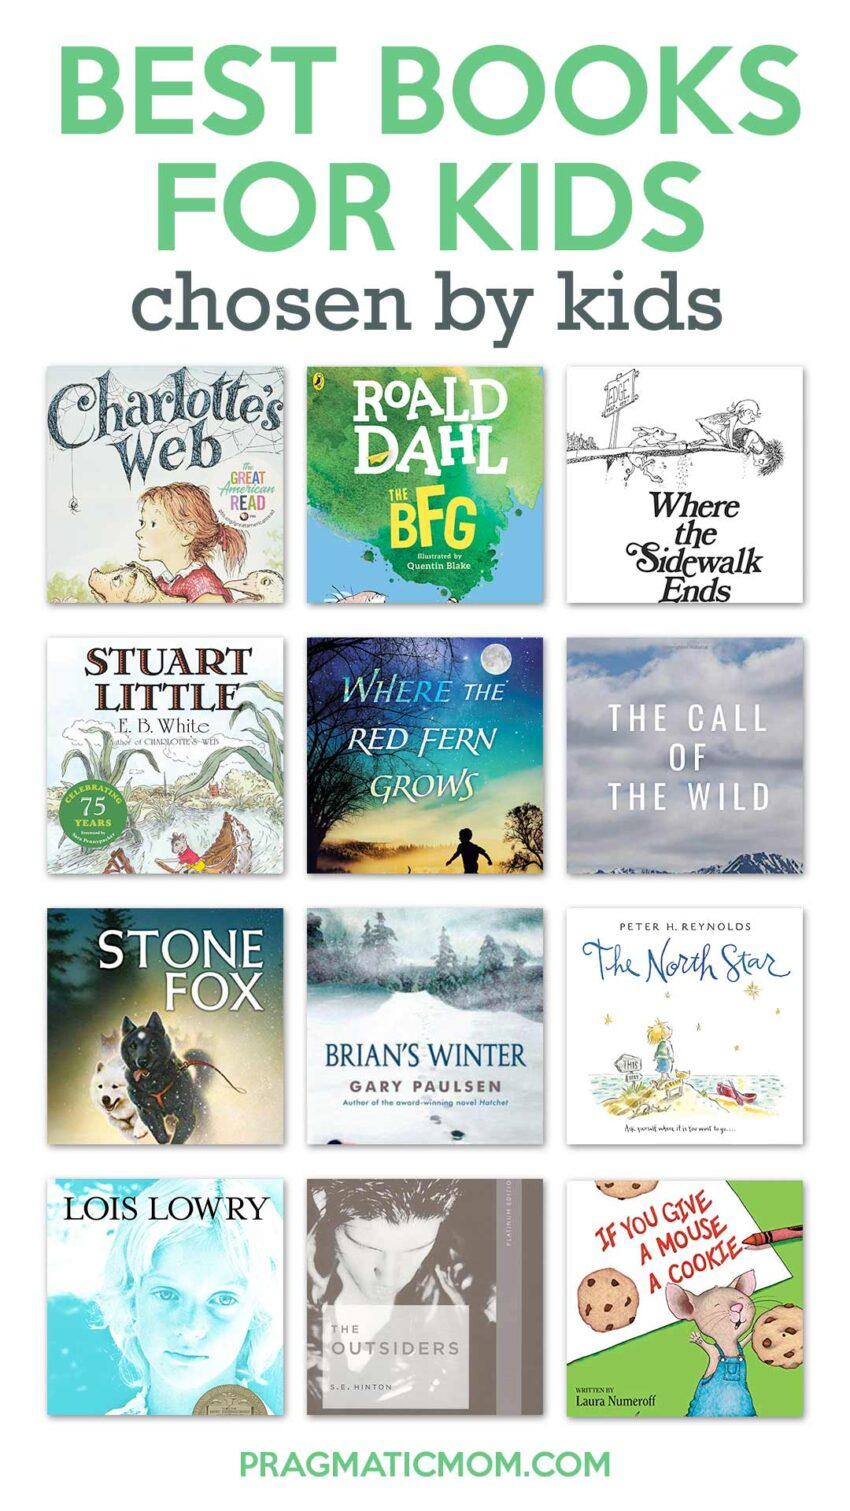 Best Books for Kids Chosen by Kids